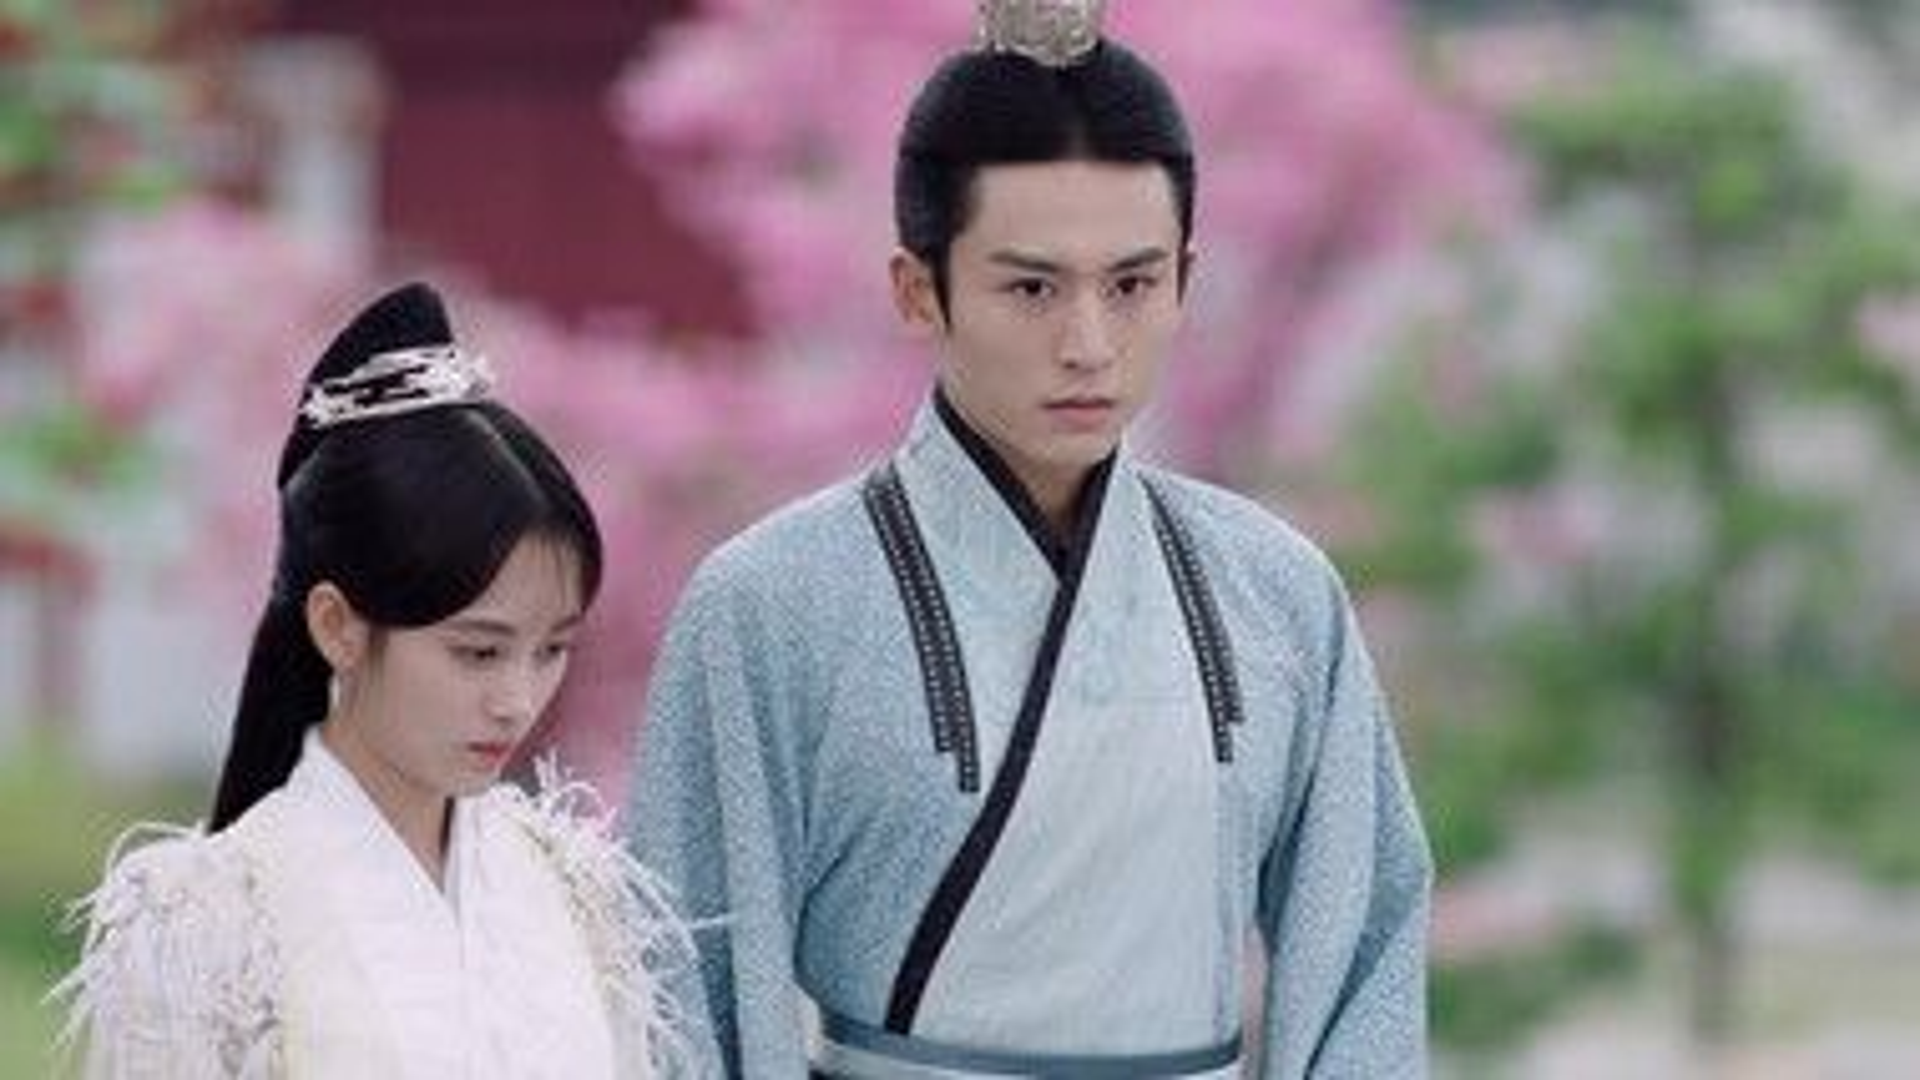 Legend of Yun Xi Episode 4